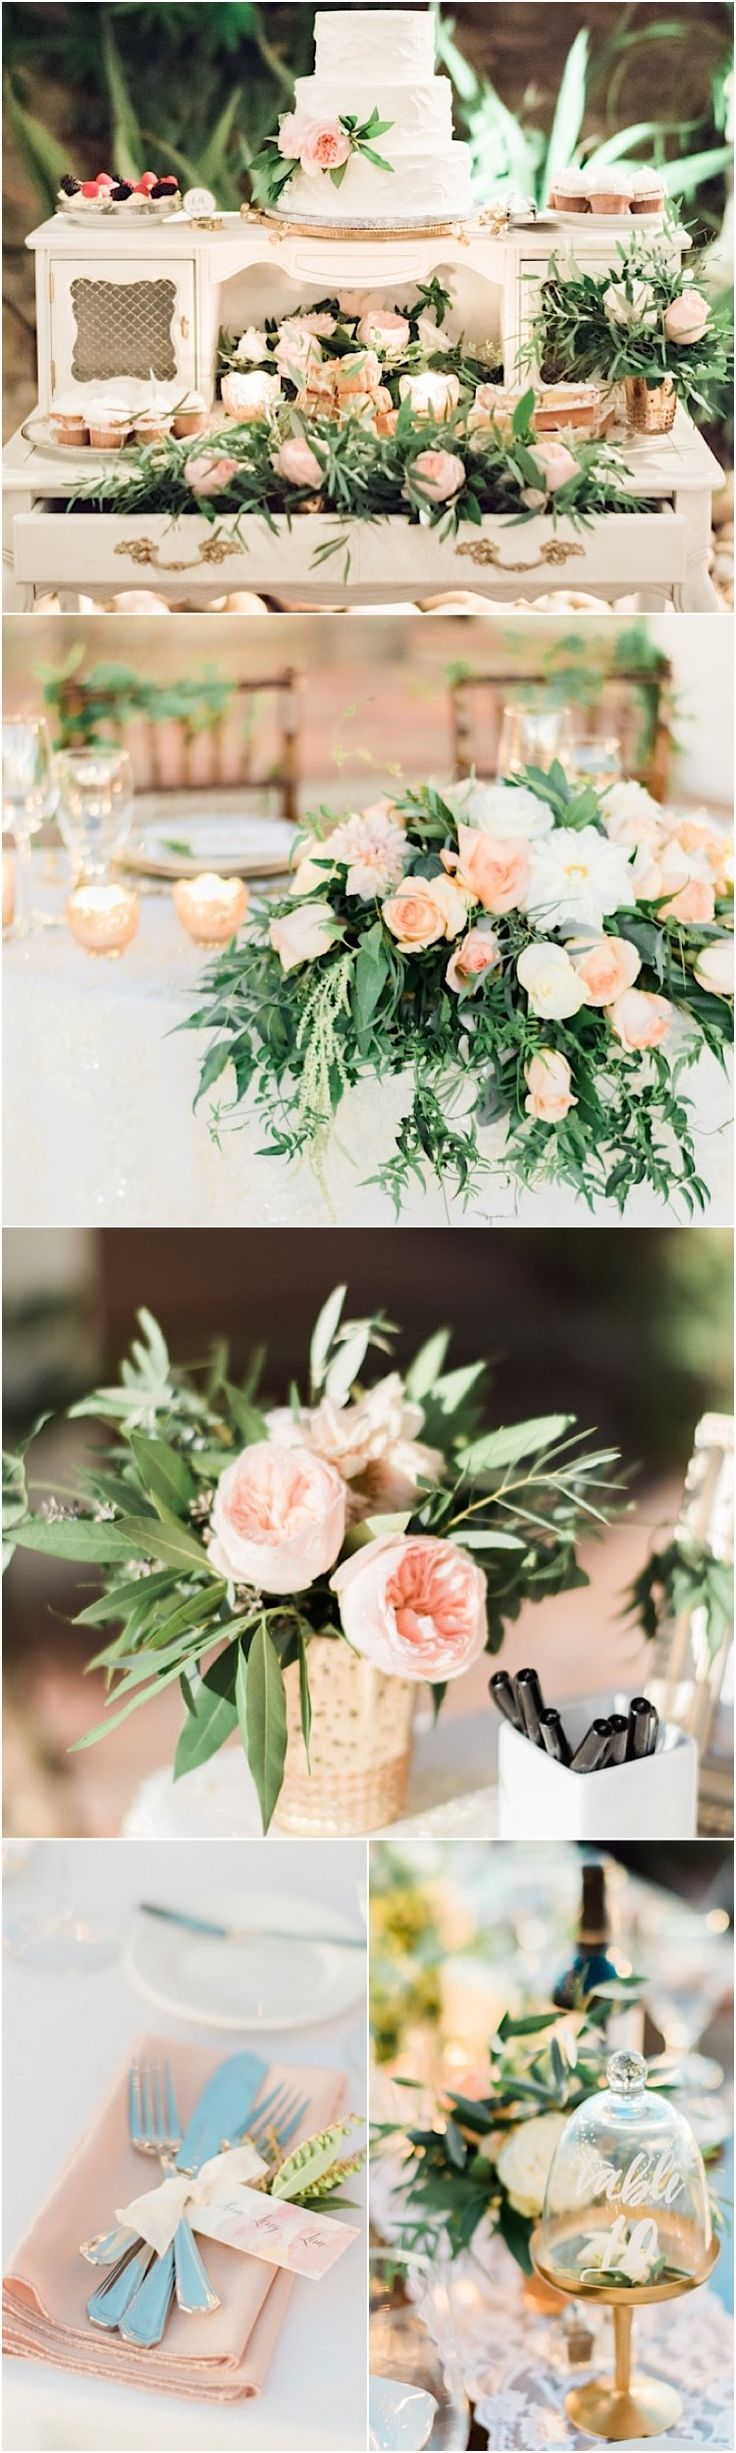 Blush wedding reception ideas; photo: Honey Honey Photography Read more at : http://theweddingly.com/